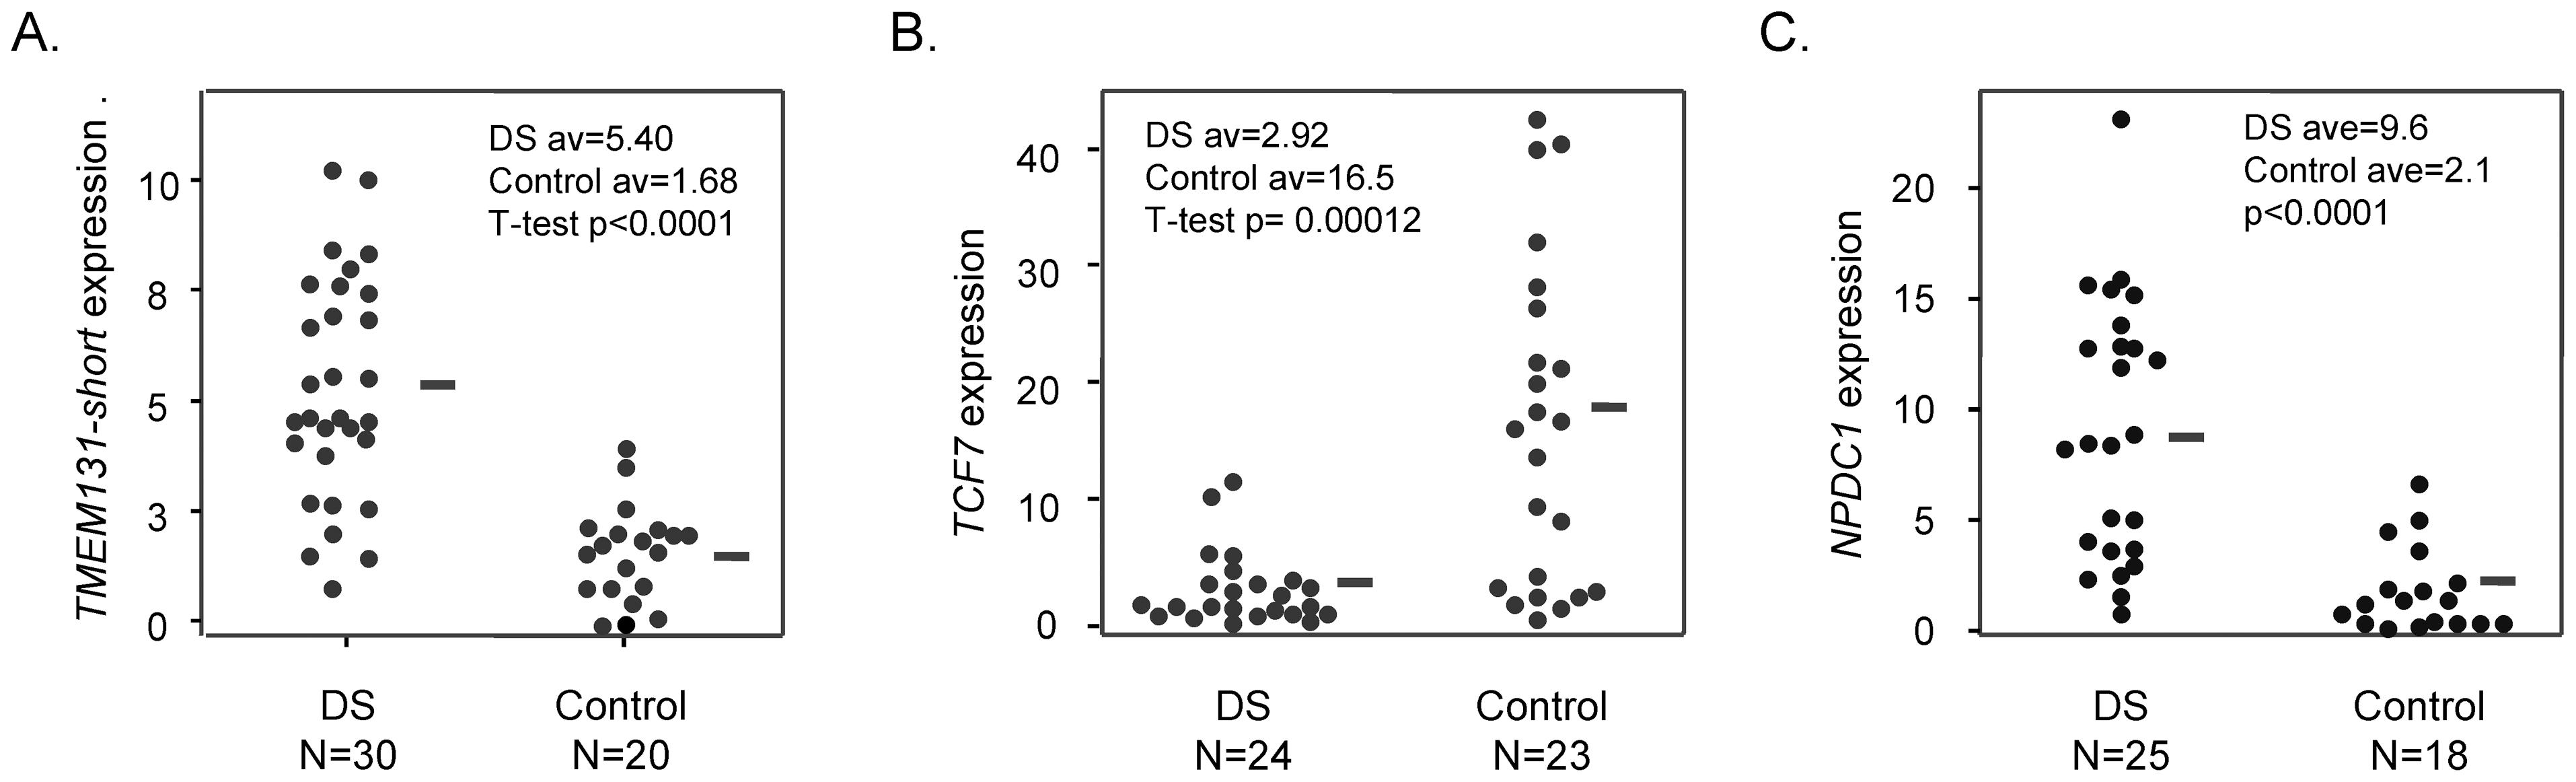 Altered mRNA expression of <i>TMEM131</i>, <i>TCF7</i>, and <i>NPDC1</i> in DS versus normal PBL.